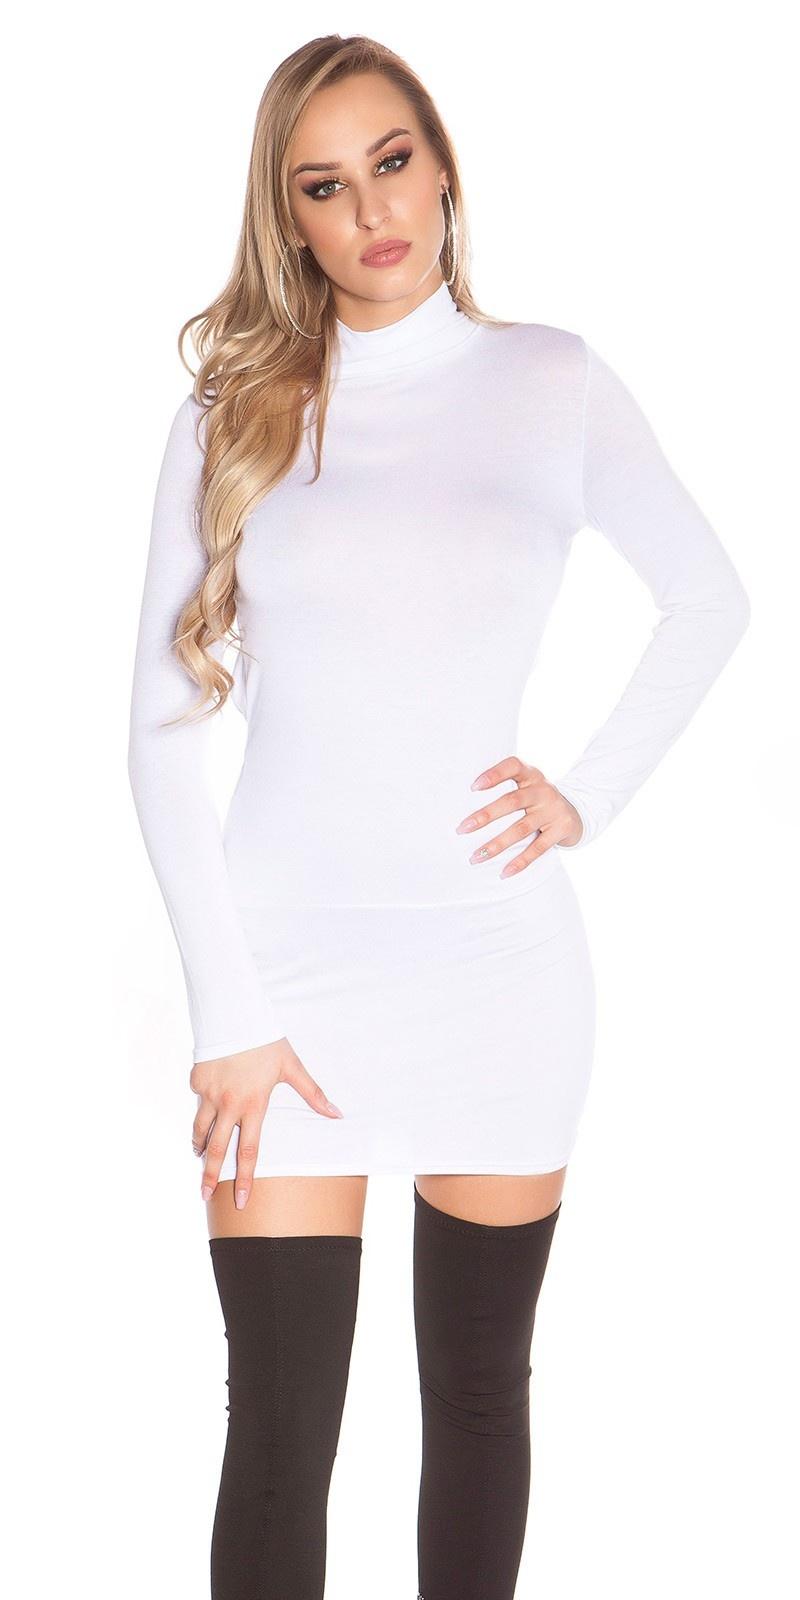 Sexy mini jurkje, open rug met col wit